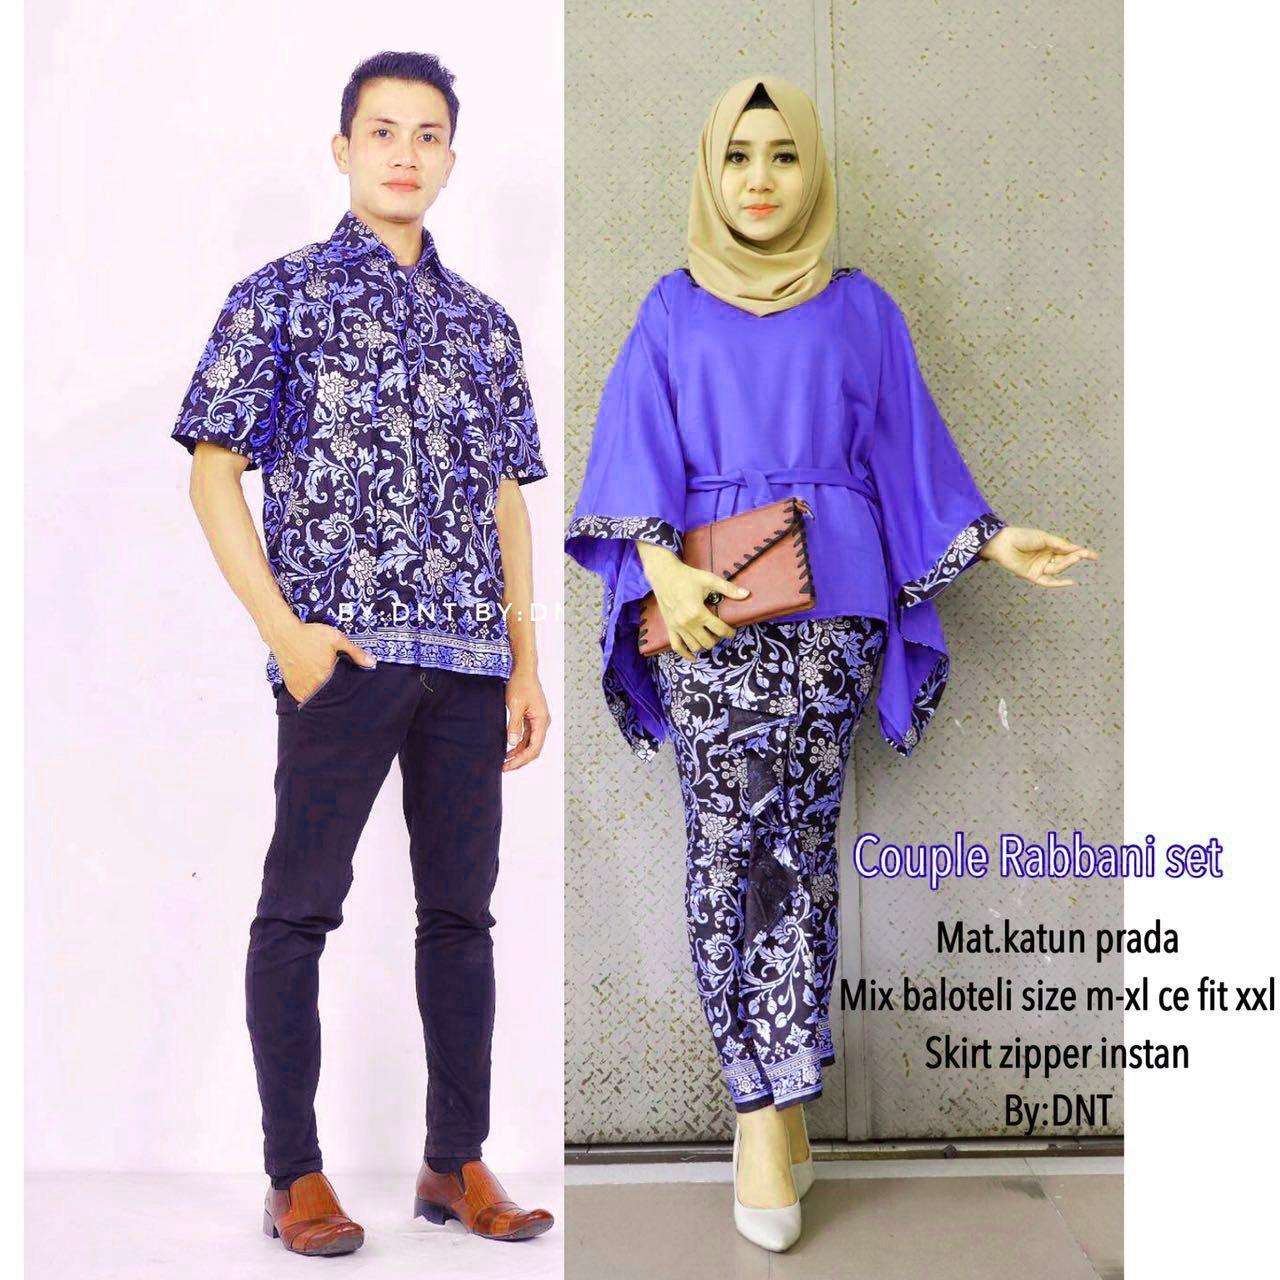 Batik Couple / Batik Sarimbit / Baju Kondangan Rabbani Set Couple